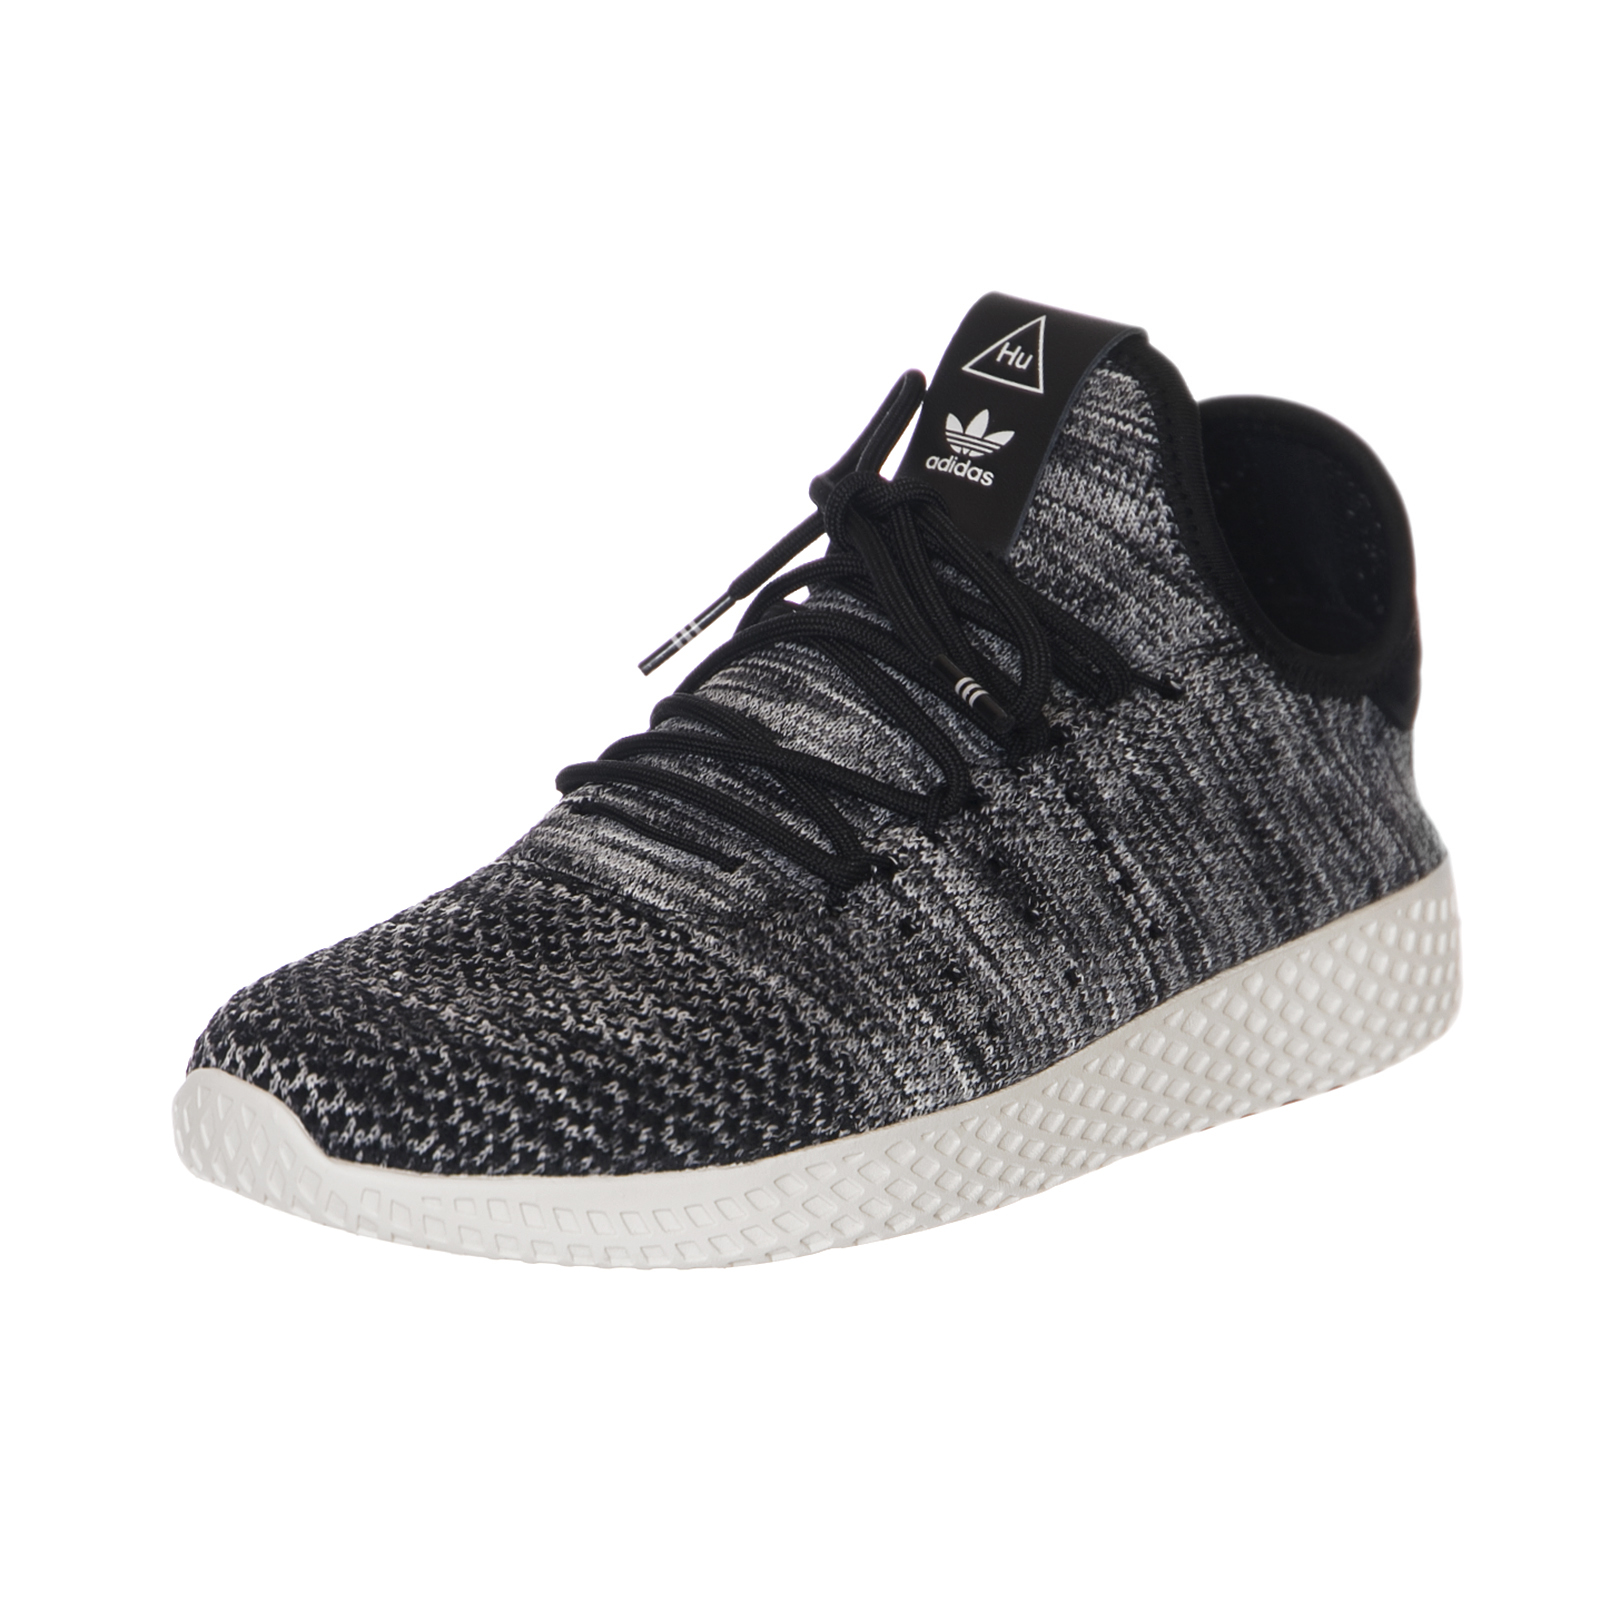 5d6bf624dcaa1 Adidas Baskets Pw Tennis Hu Pk Blanc   Black Noir